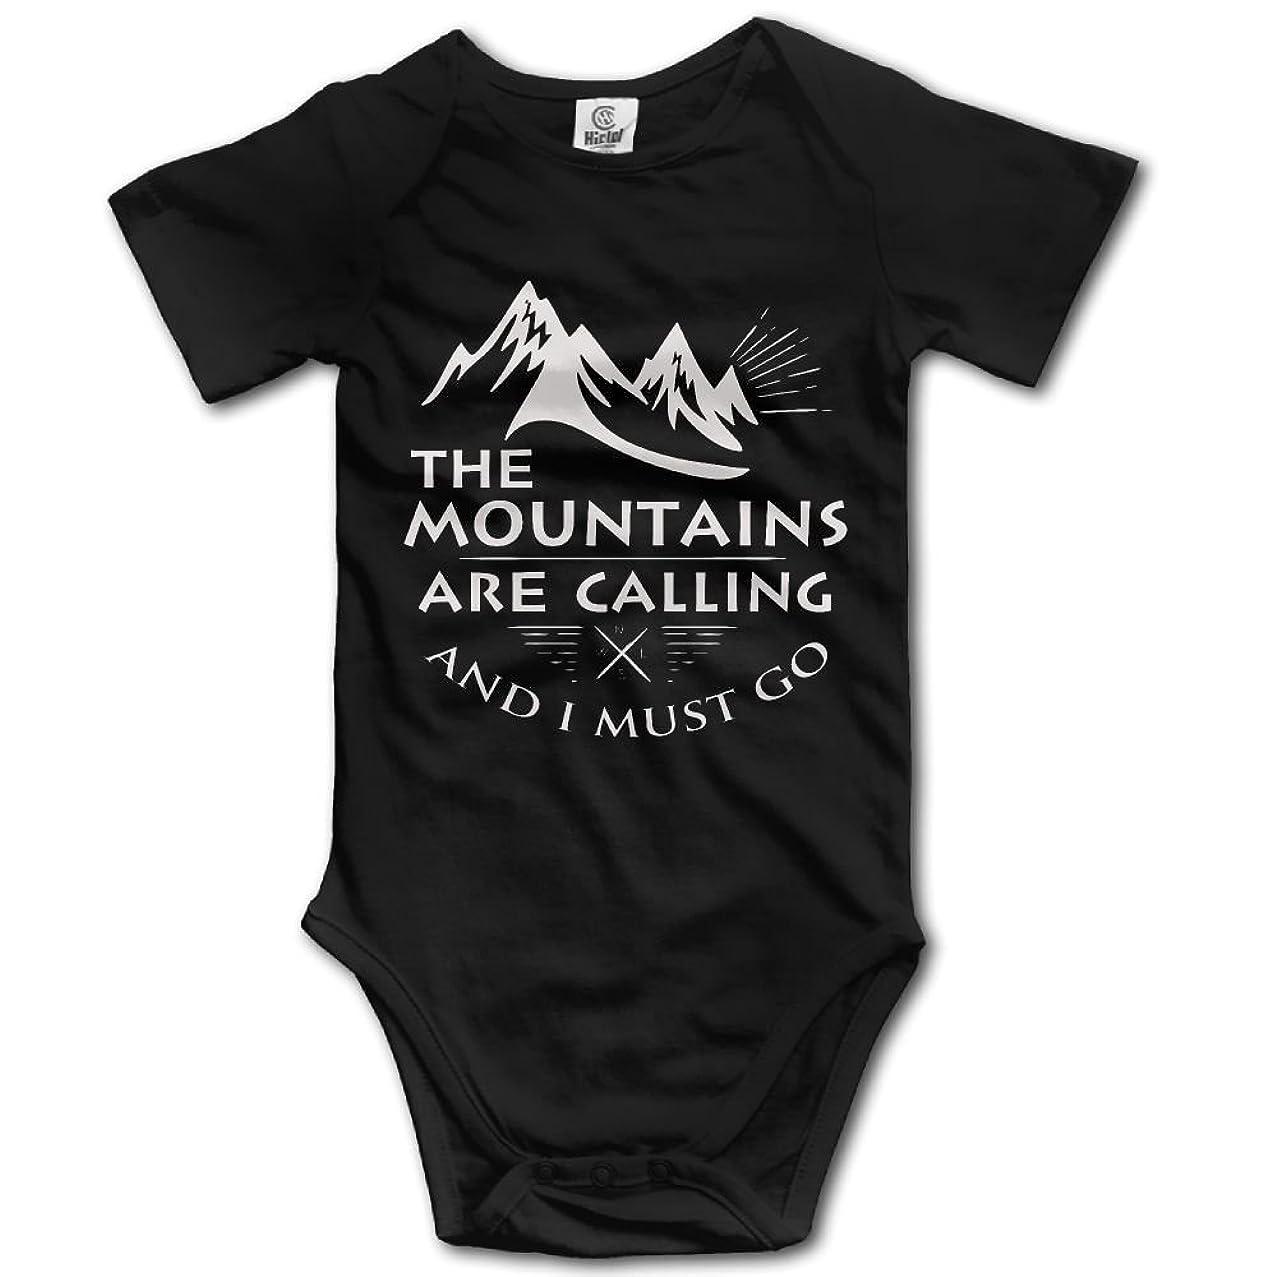 The Mountains are Calling Baby Infant Bodysuit - Short Sleeve Onesie Romper Black